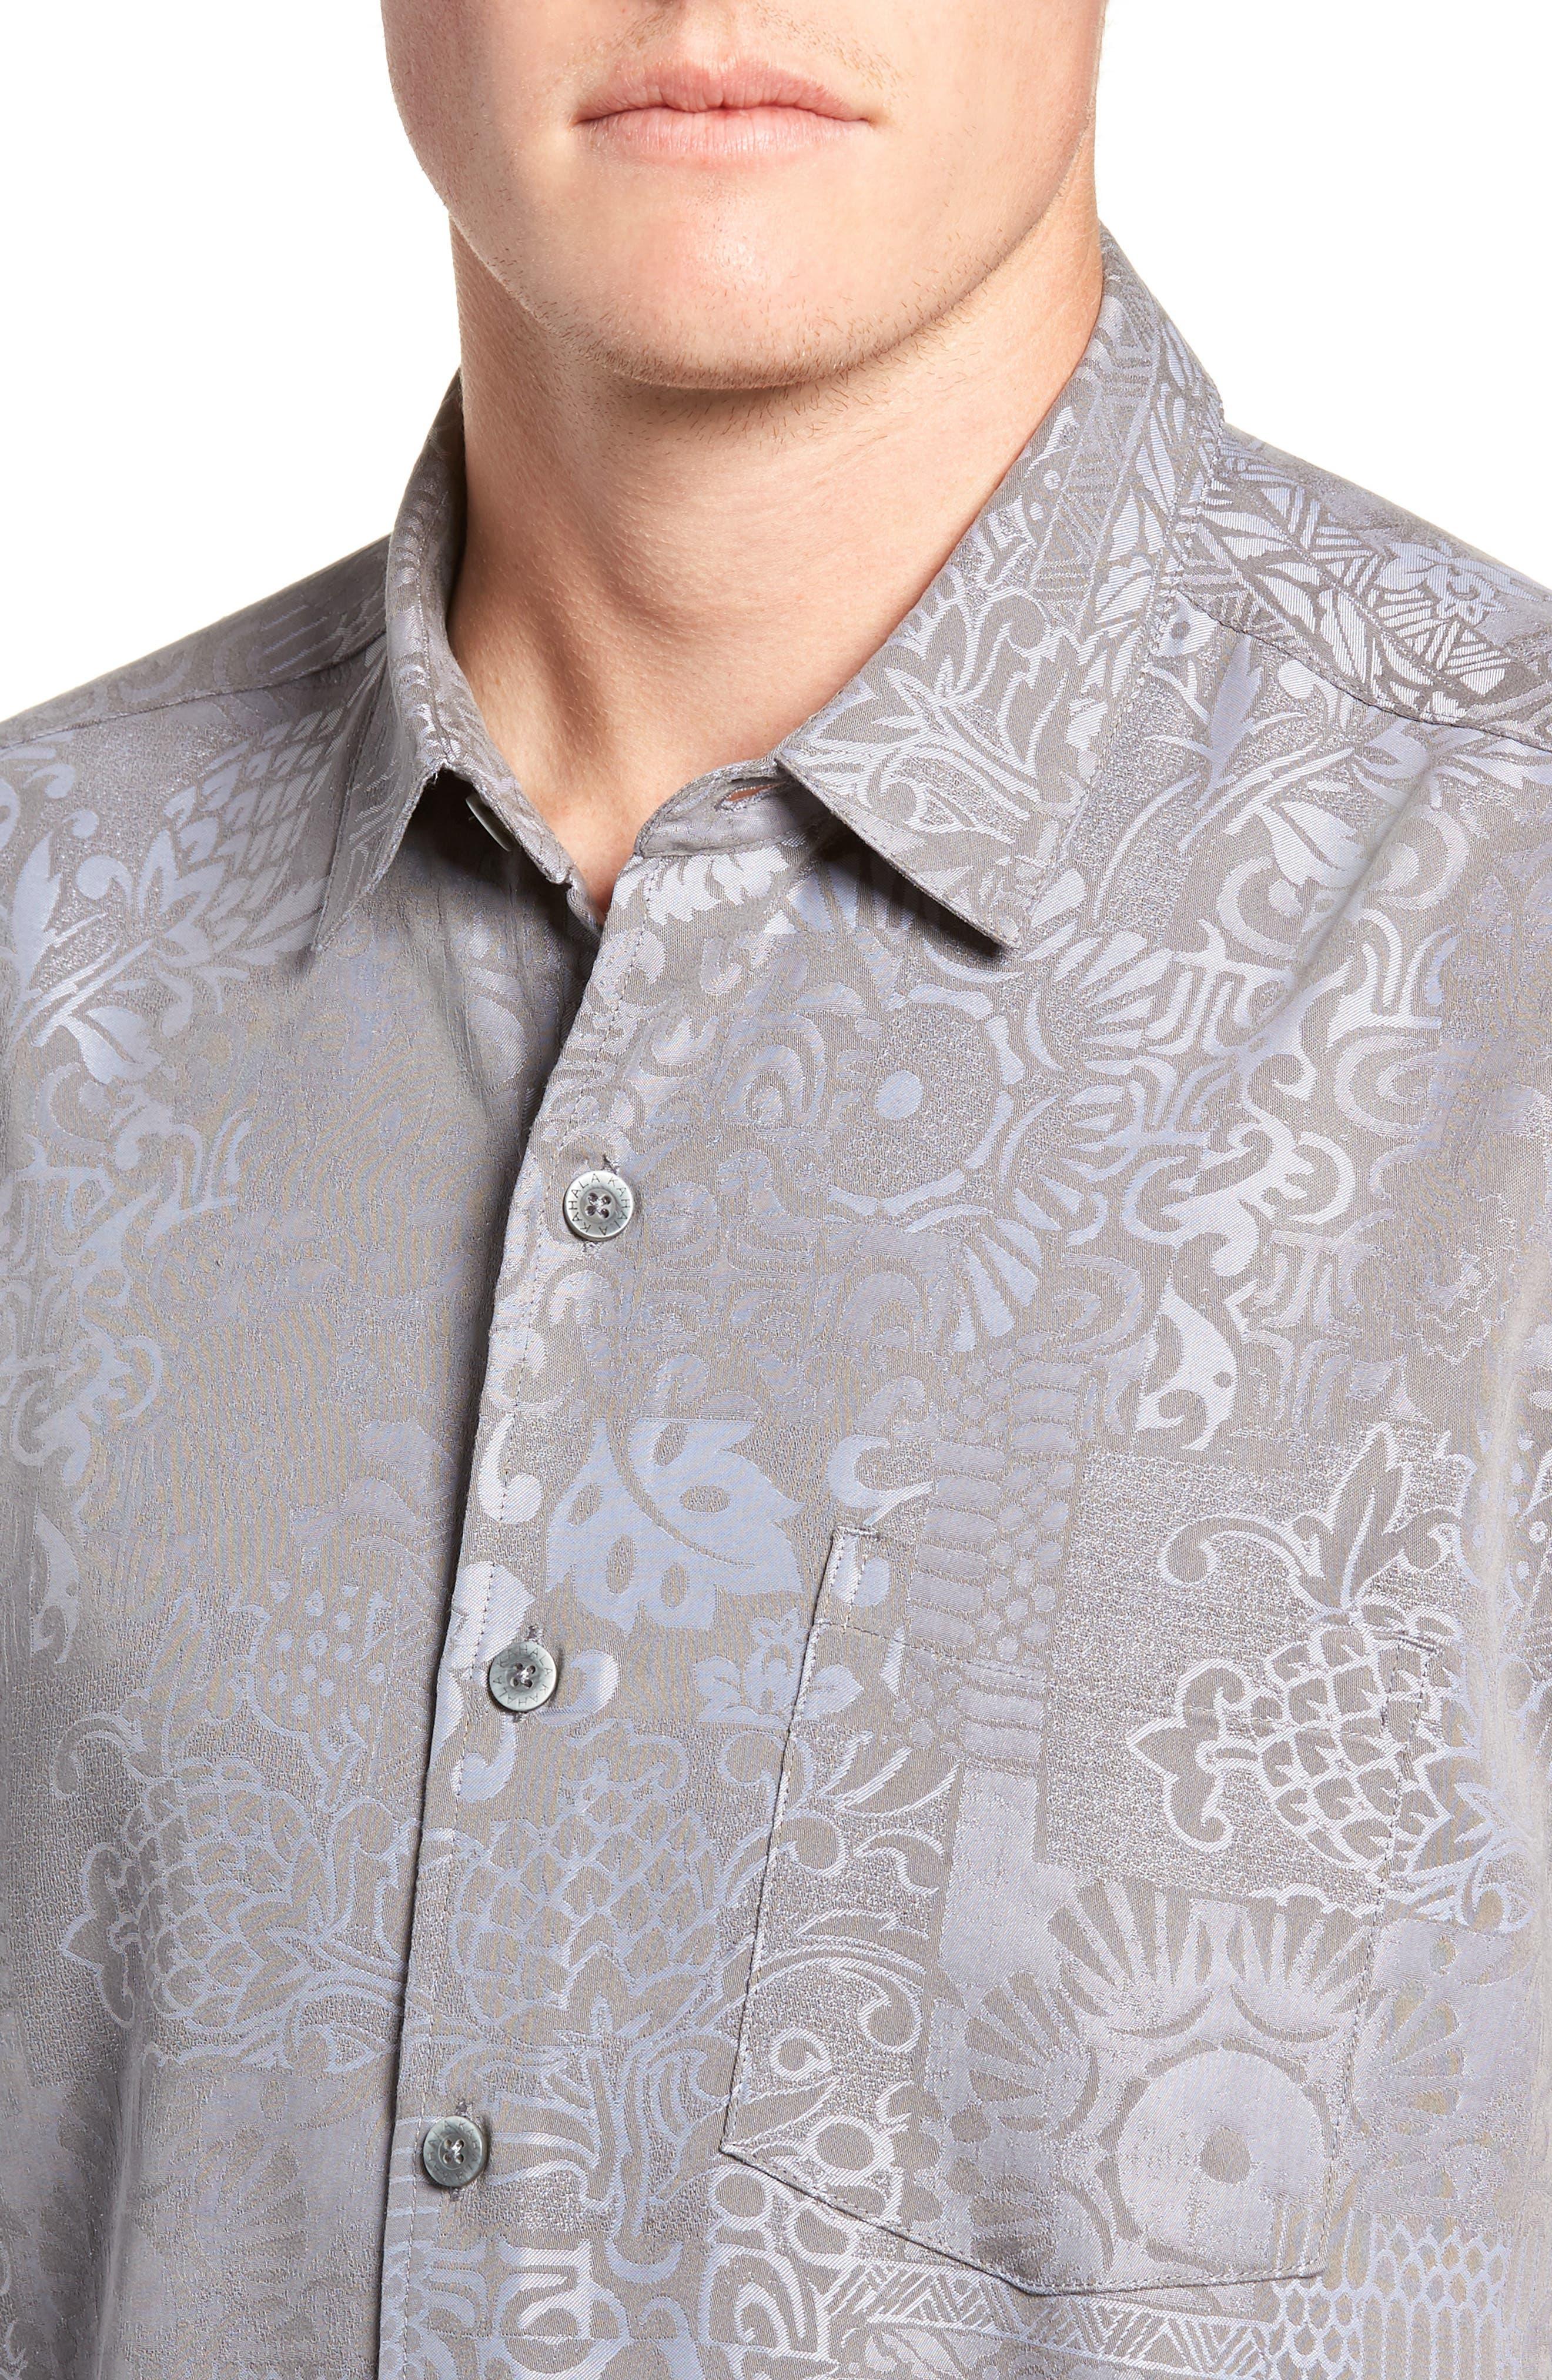 Apana Classic Fit Jacquard Sport Shirt,                             Alternate thumbnail 2, color,                             CHARCOAL